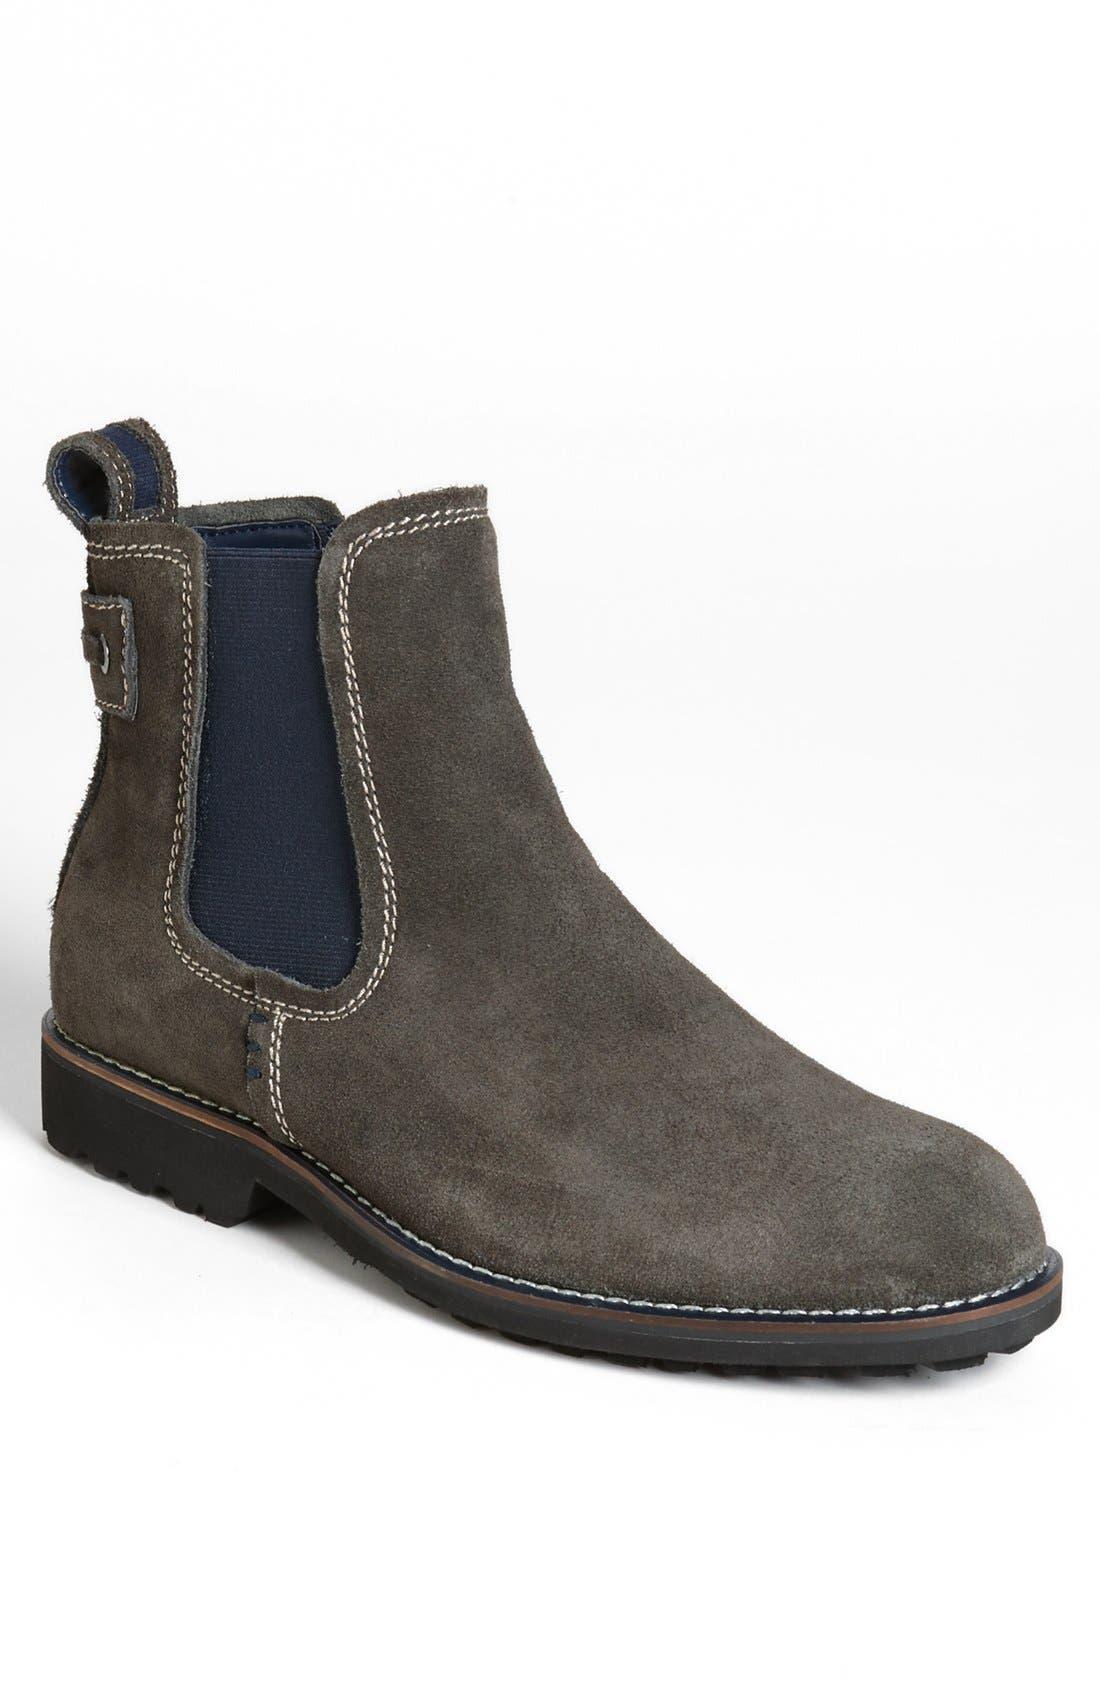 Main Image - G.H. Bass & Co. 'Kennett' Chelsea Boot